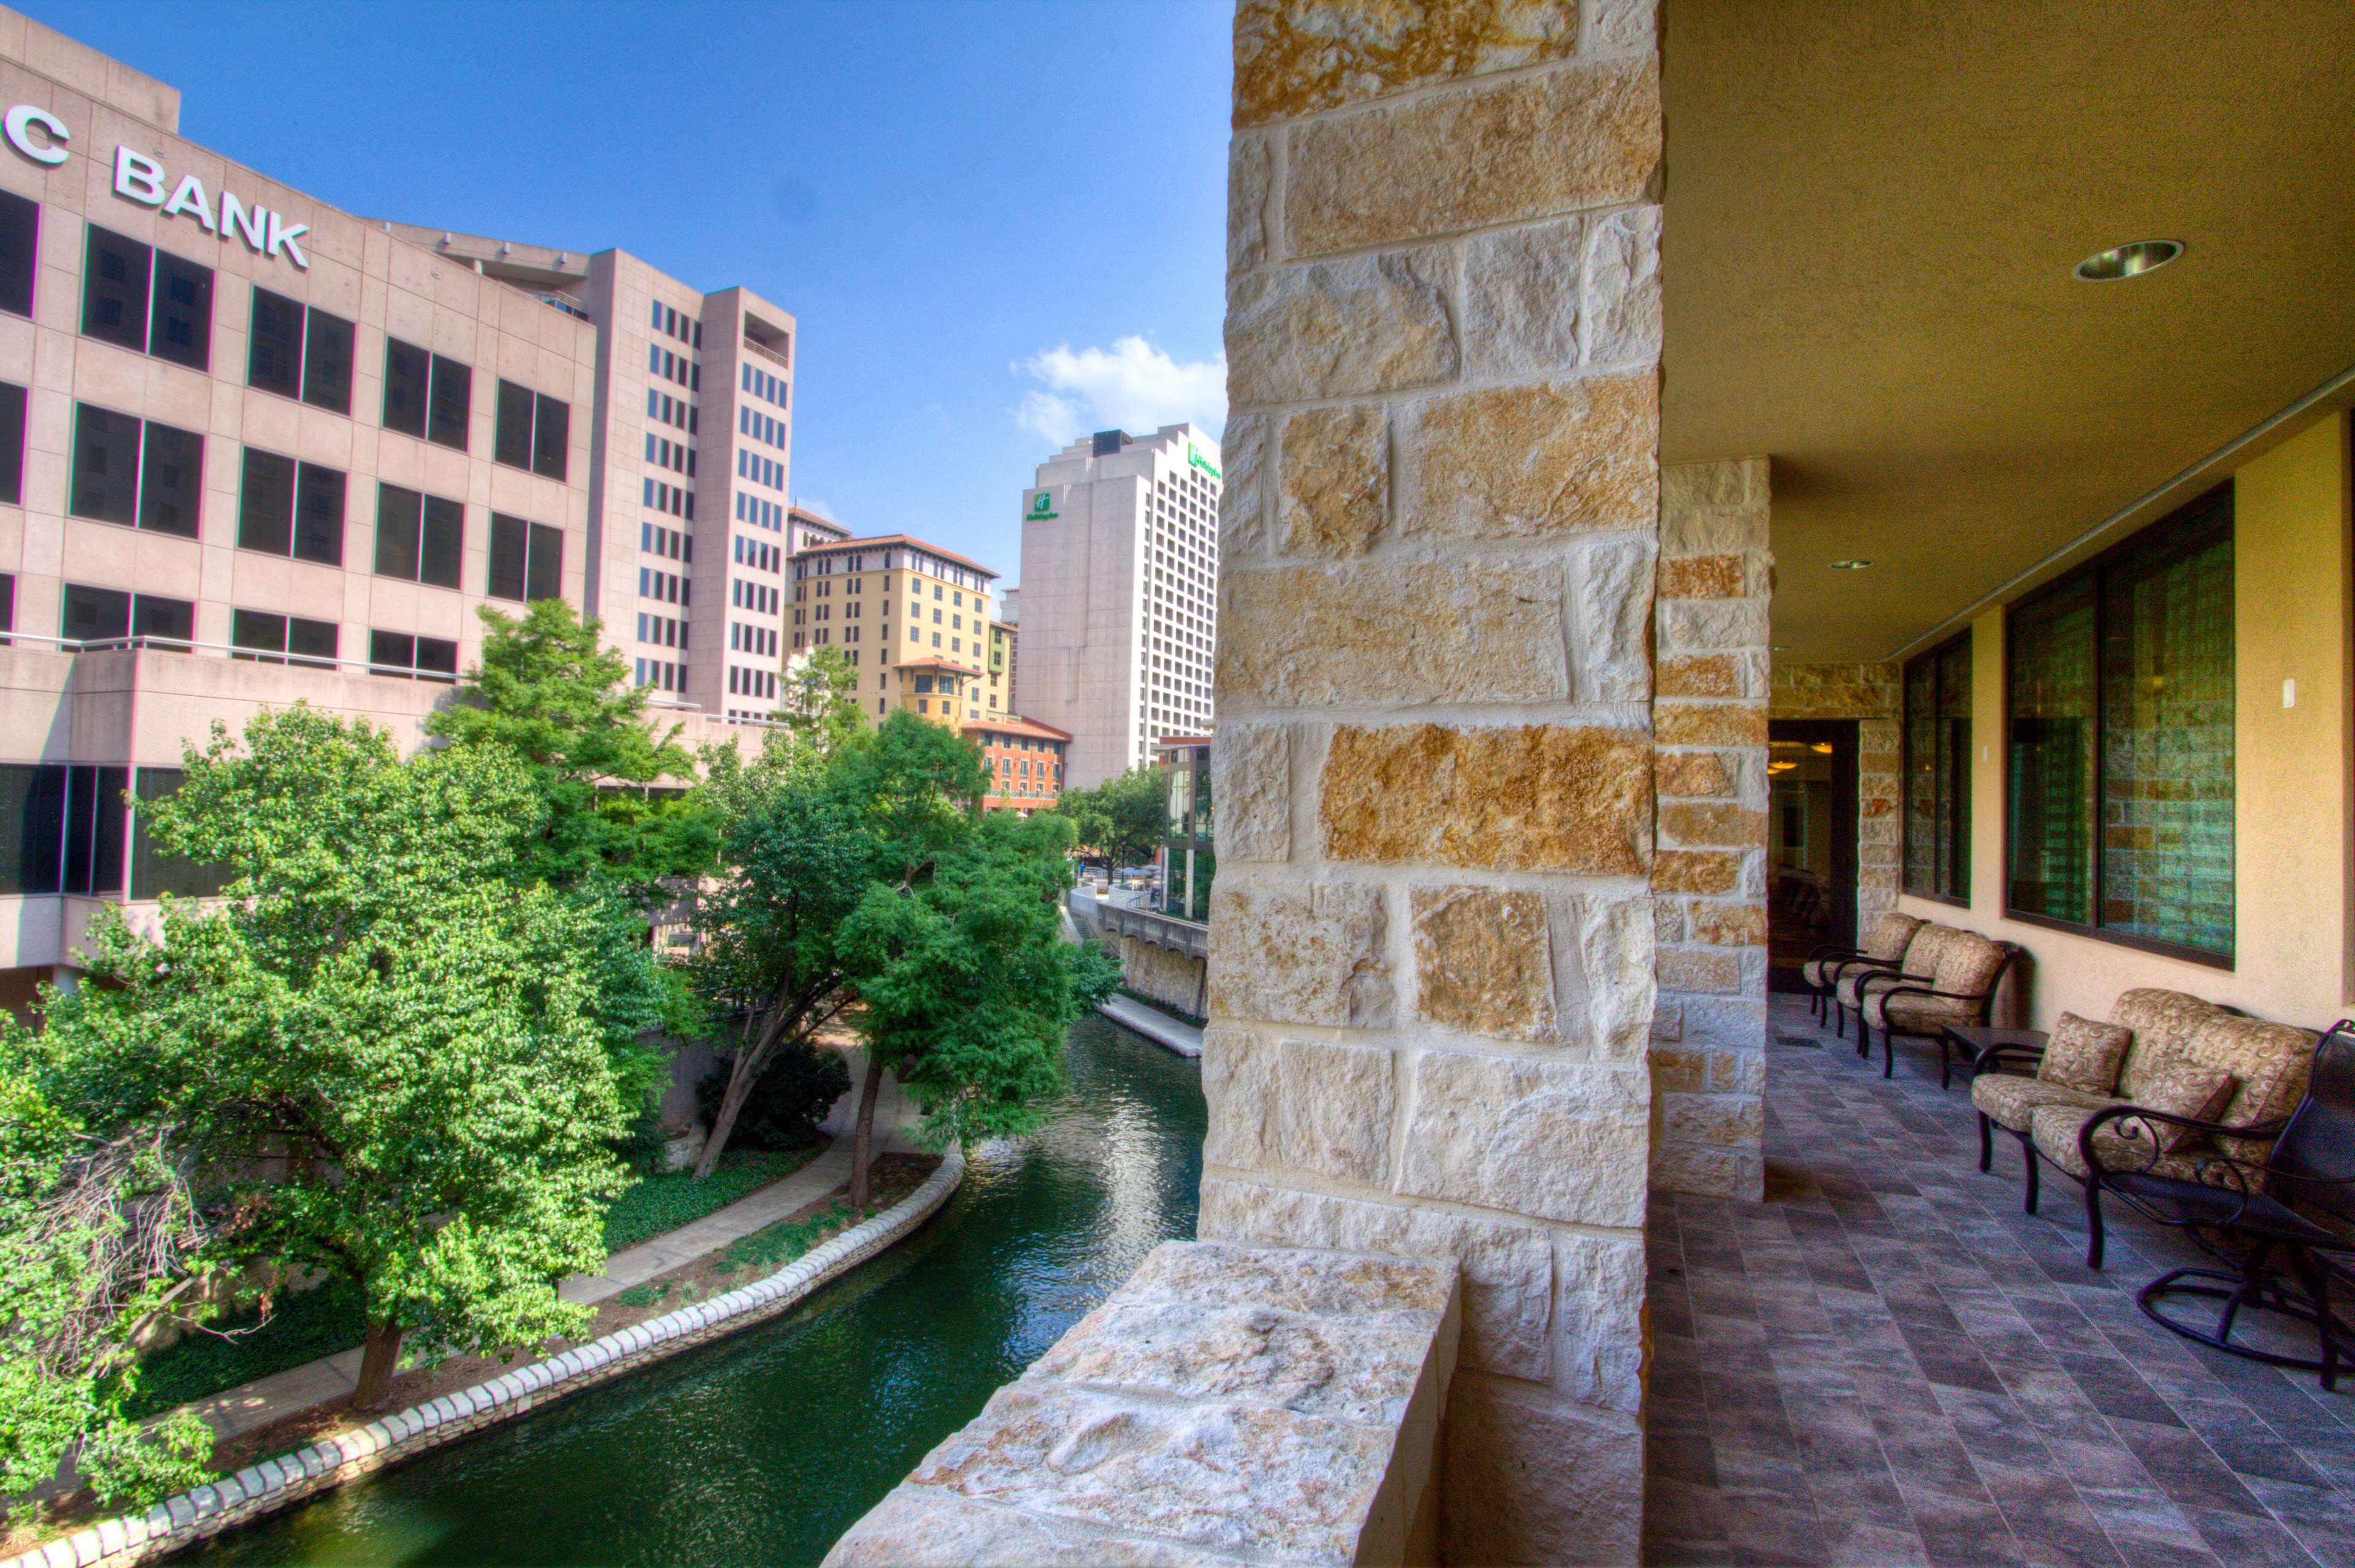 Embassy Suites by Hilton San Antonio Riverwalk Downtown